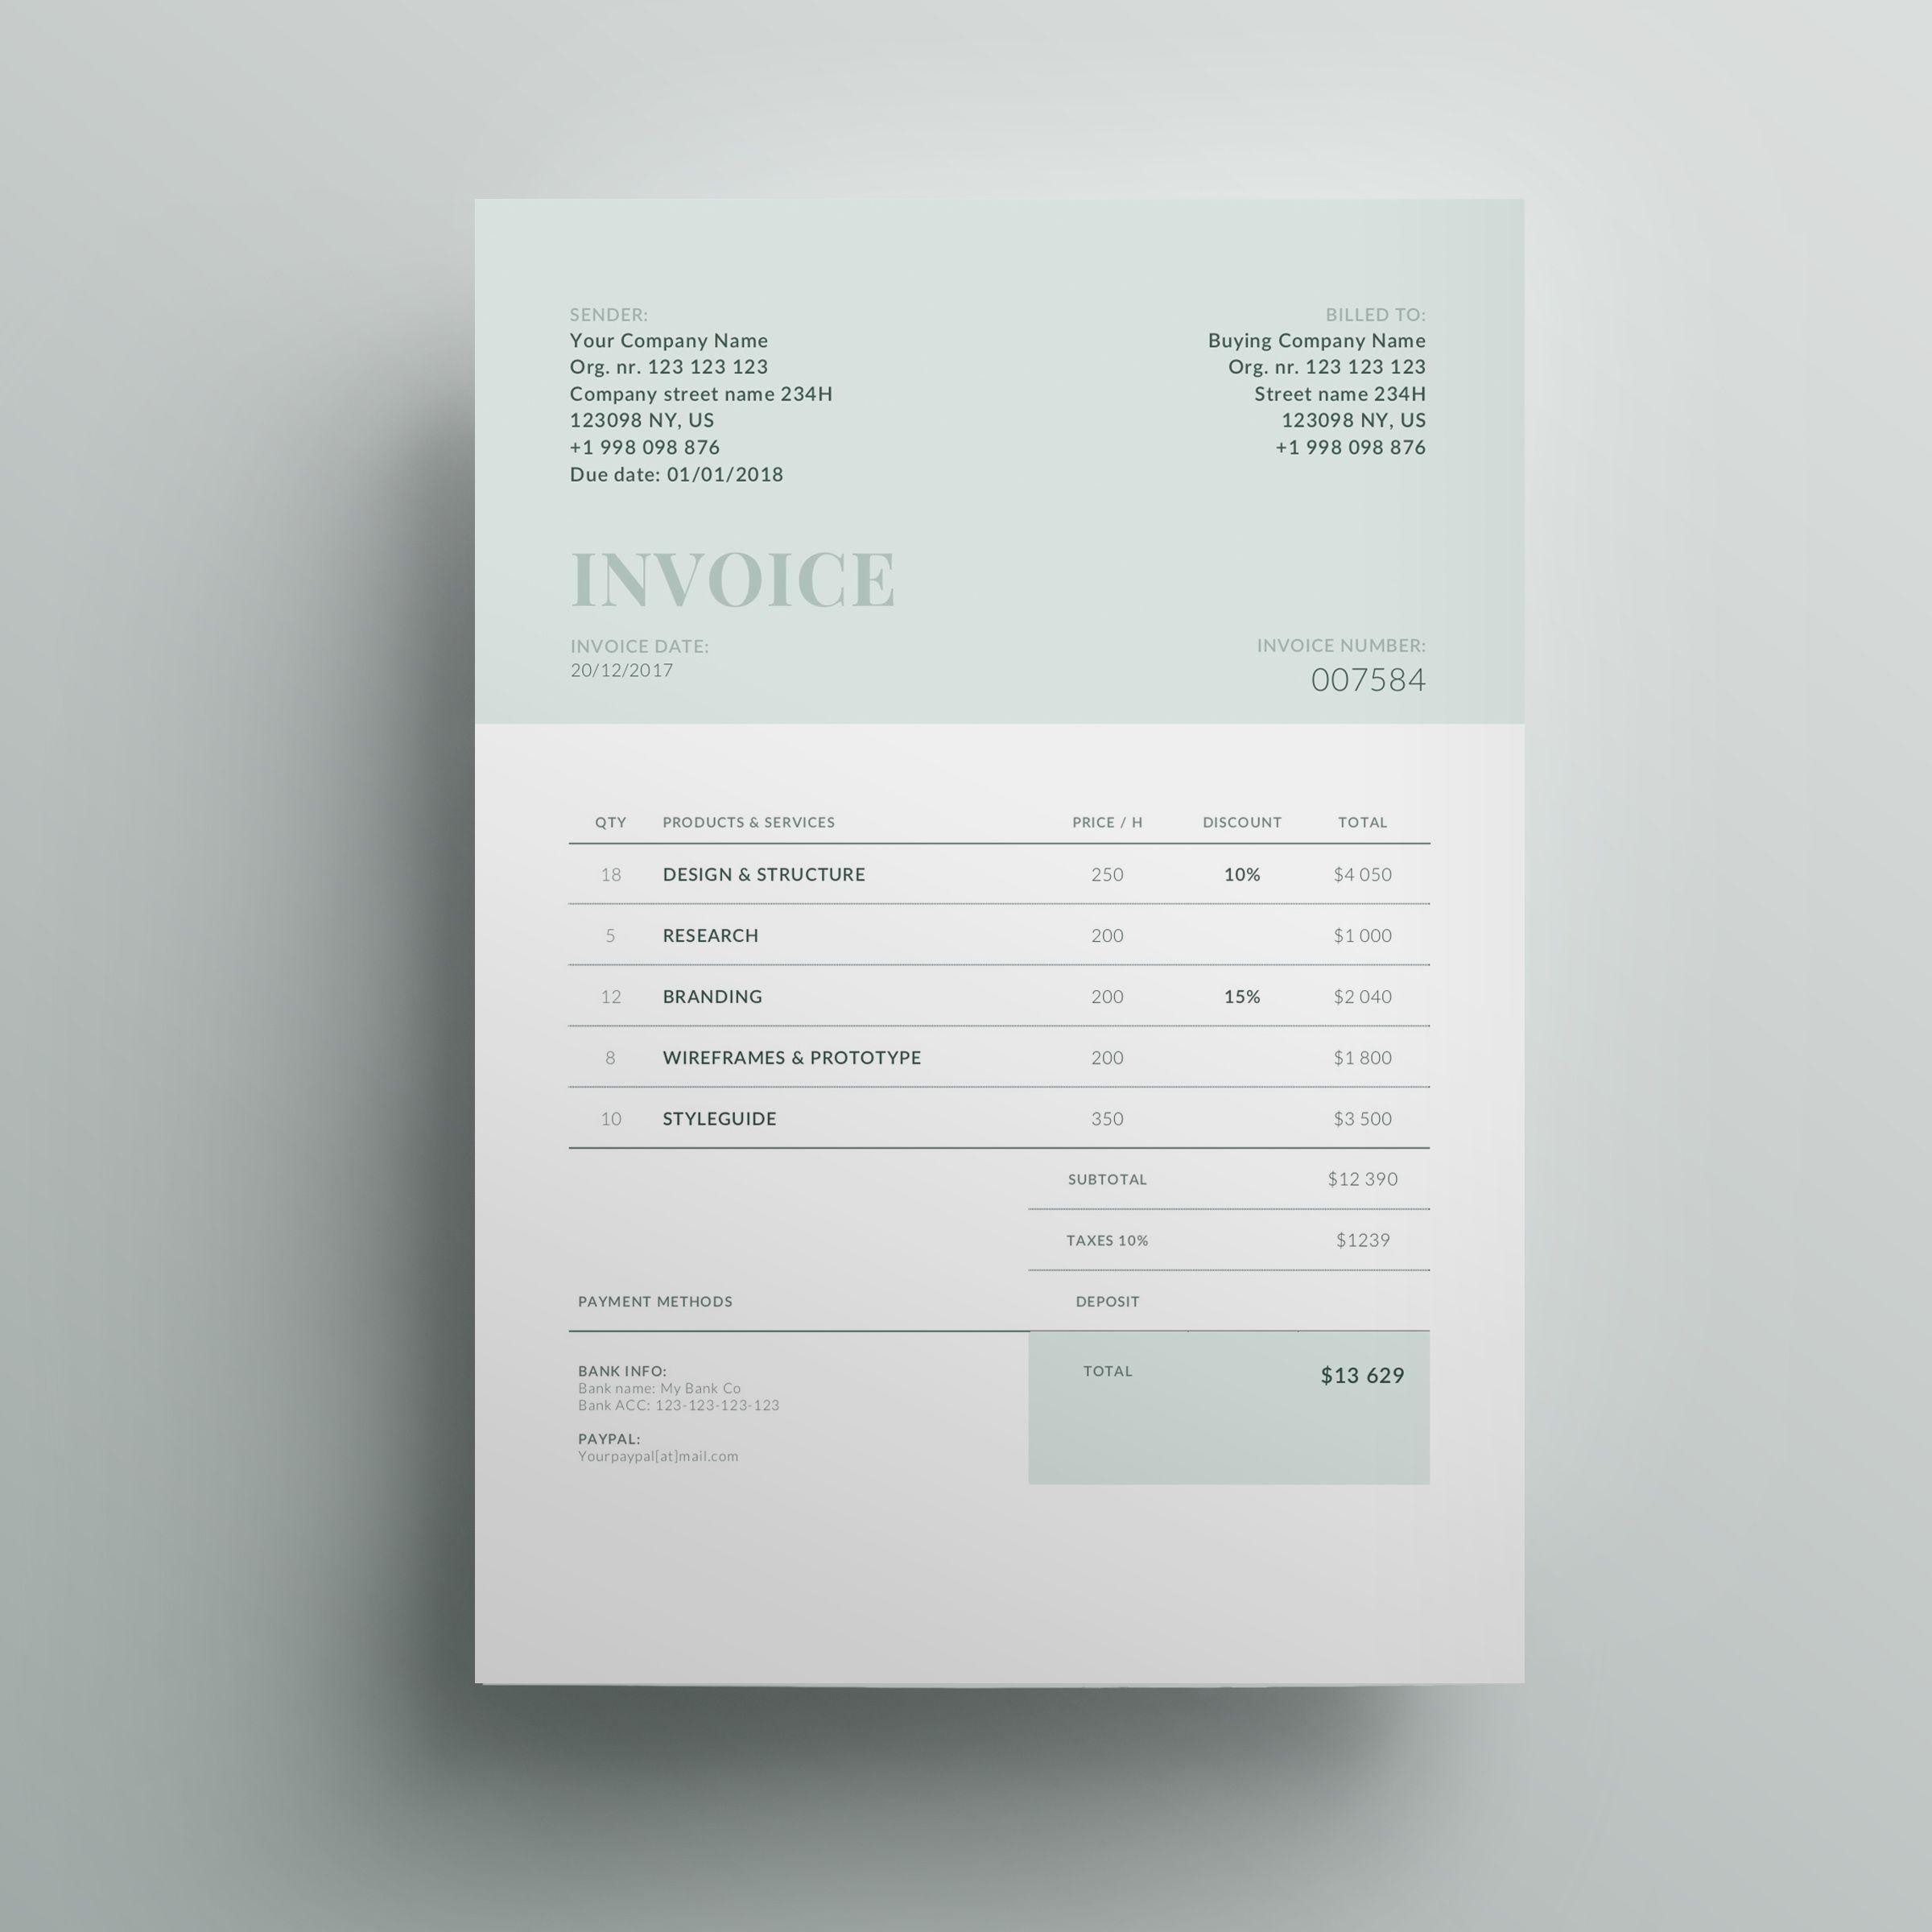 Invoice Template Business Invoice Receipt Template Etsy Photography Invoice Template Photography Invoice Invoice Design